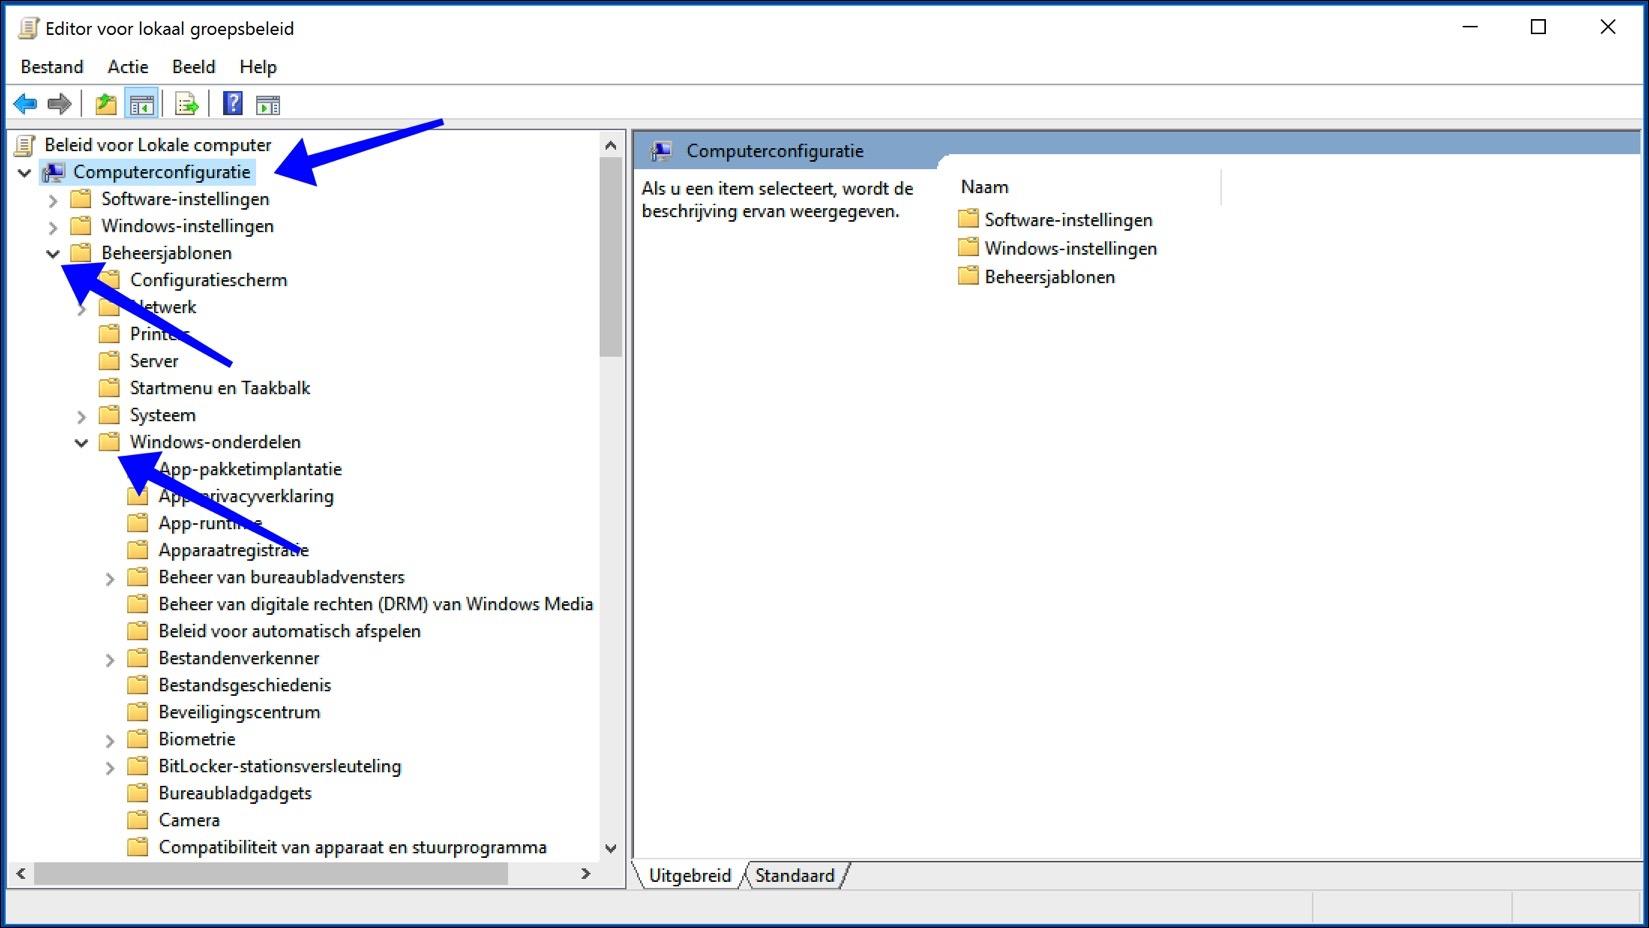 groepsbeleid editor windows 10